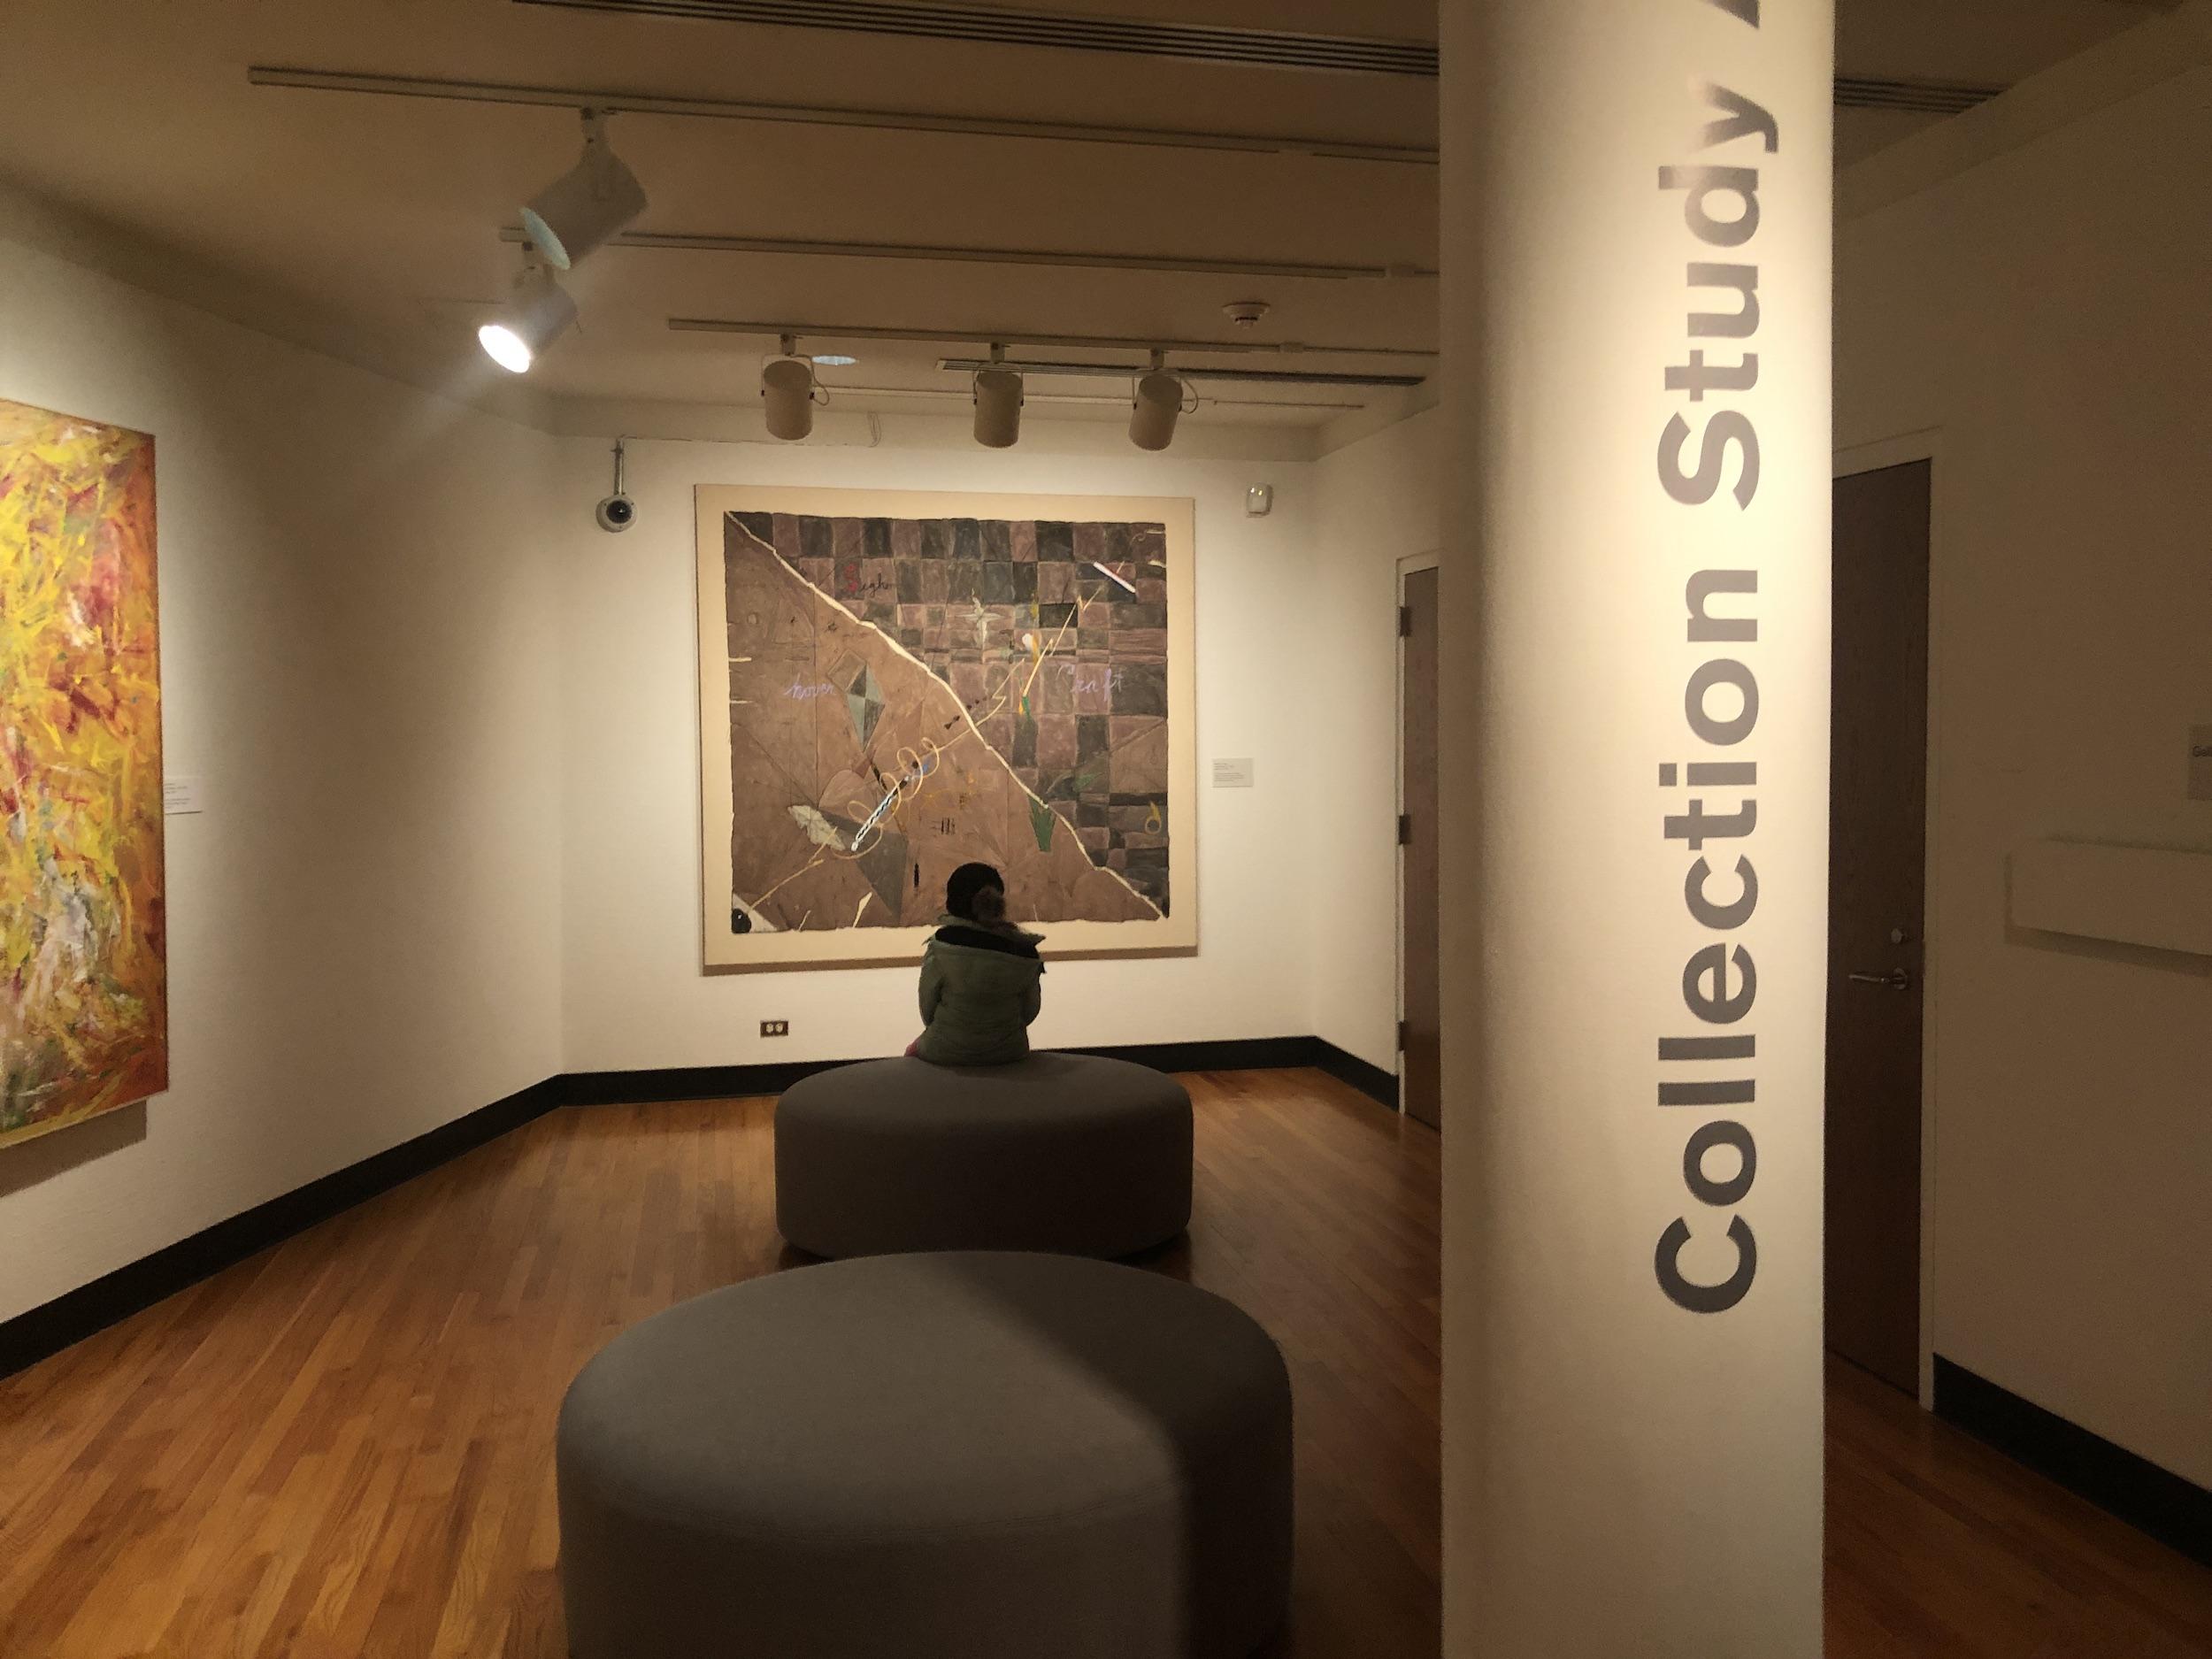 Studying Art at Krannert Art Museum